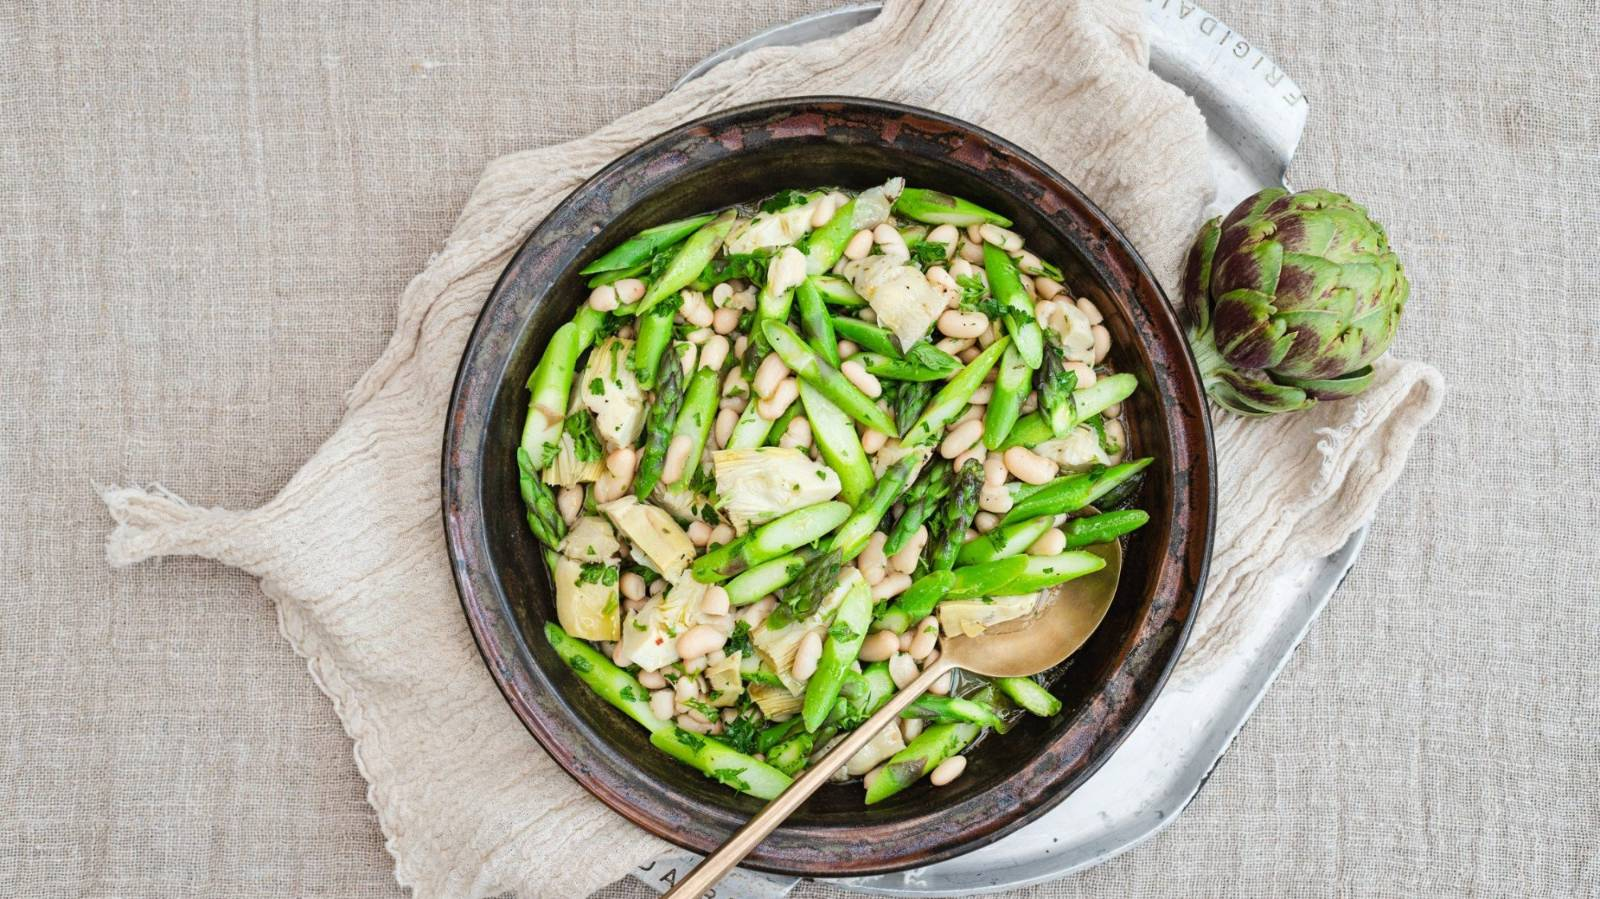 How to make a delicious artichoke & asparagus white bean salad